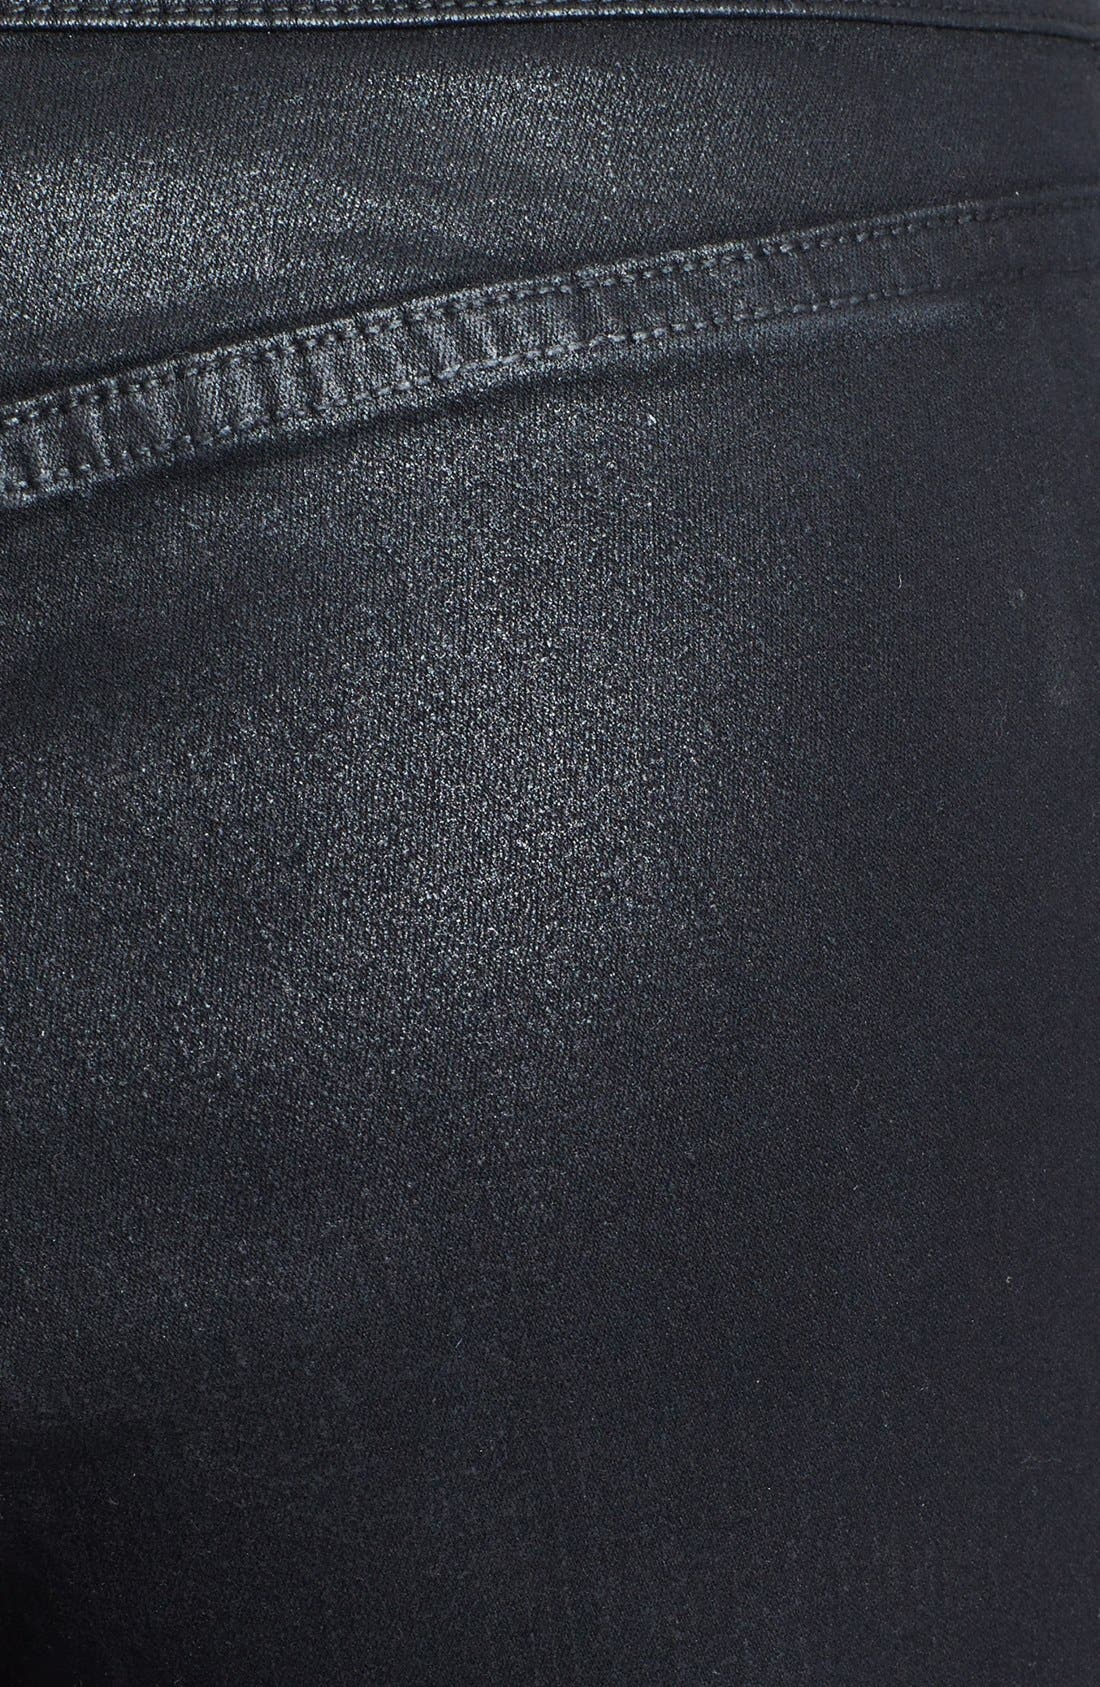 Alternate Image 3  - NYDJ Coated Stretch Skinny Jeans (Black)